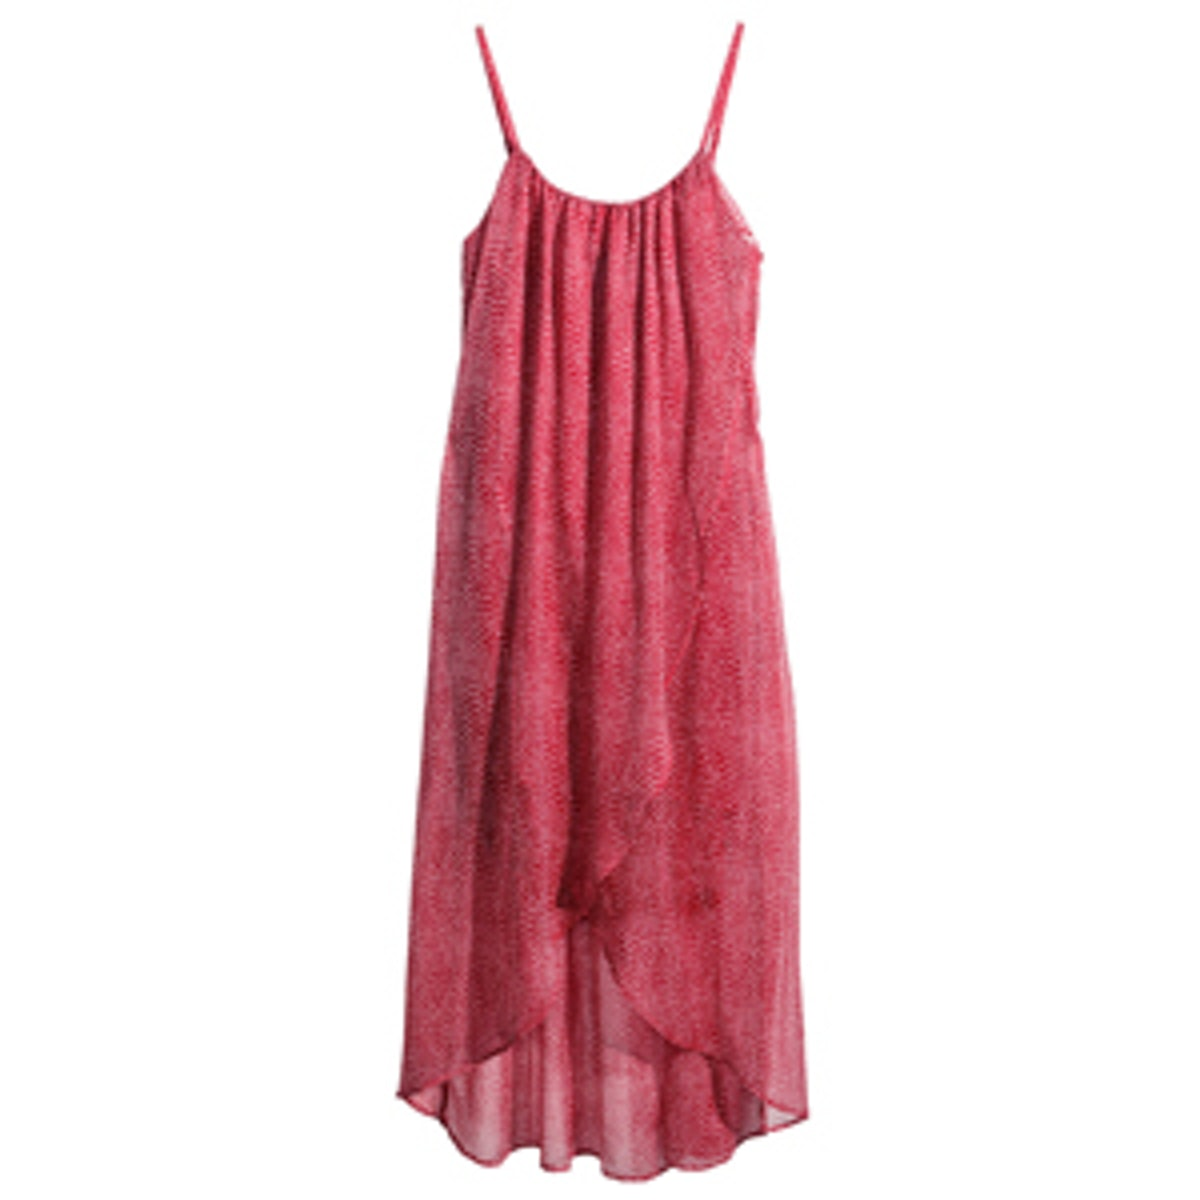 Chiffon Dress in Red